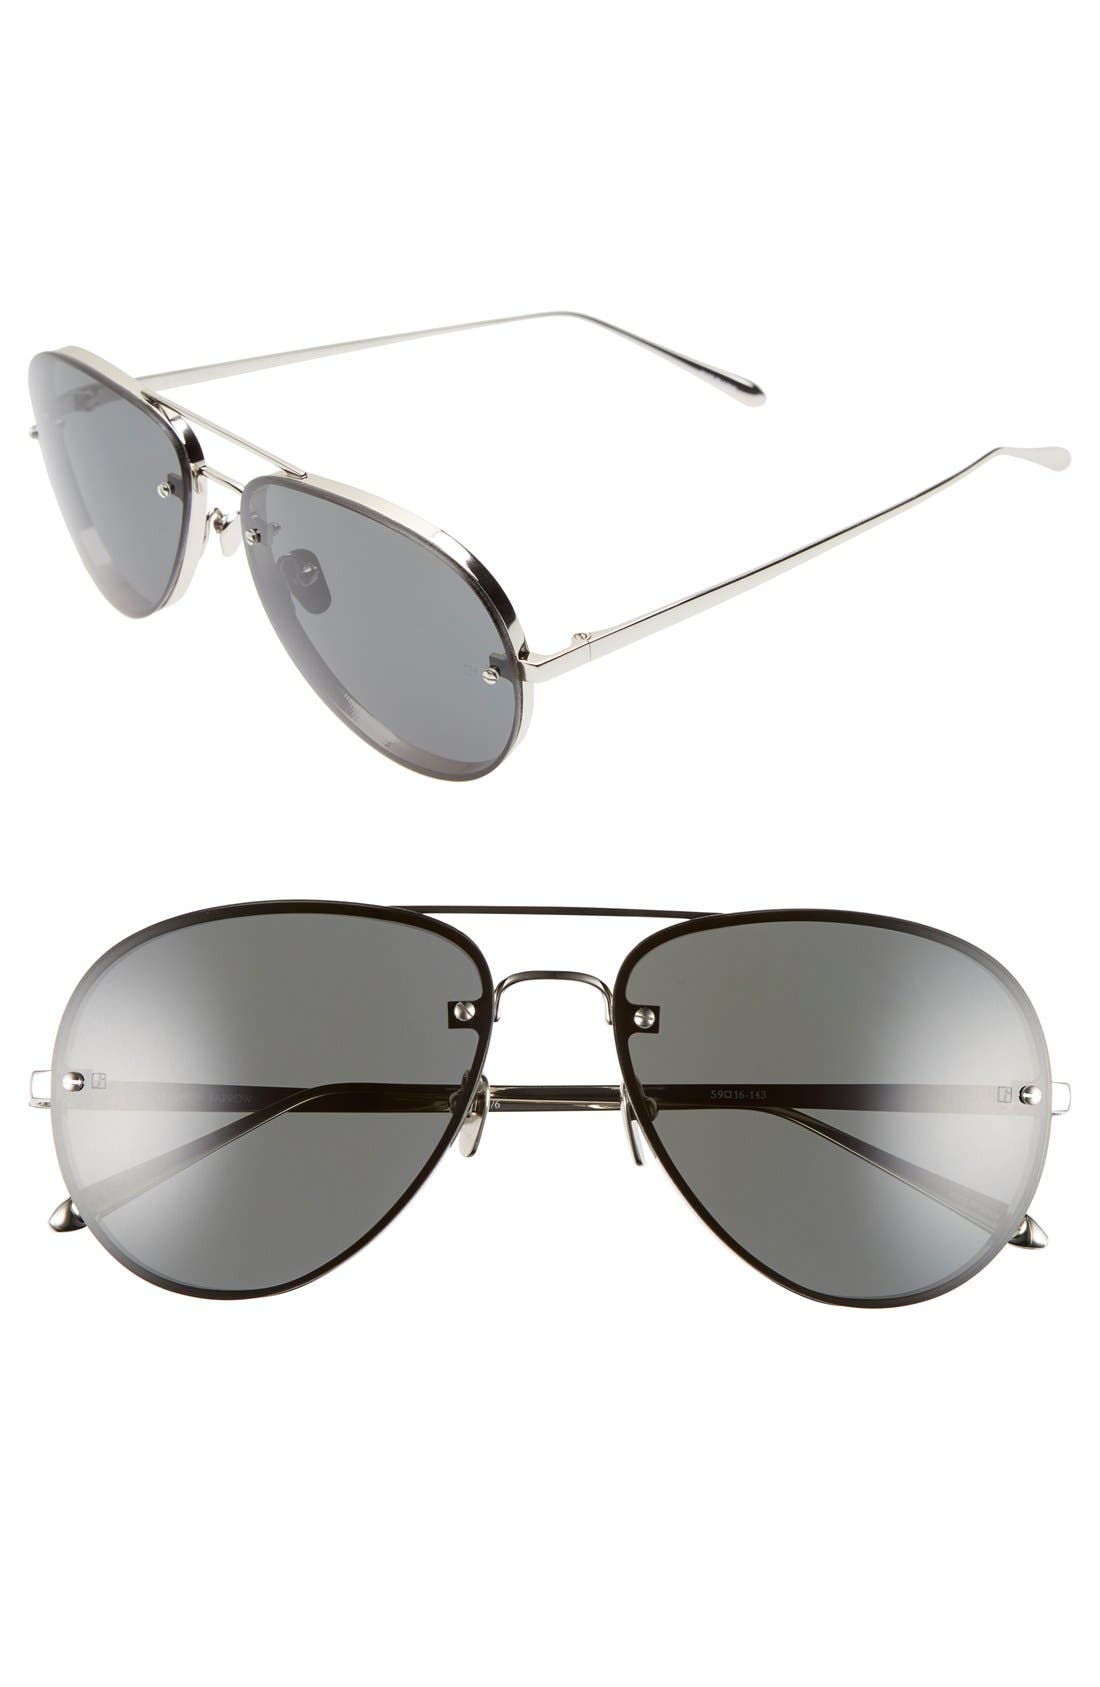 LINDA FARROW 59mm Aviator 18 Karat White Gold Trim Sunglasses